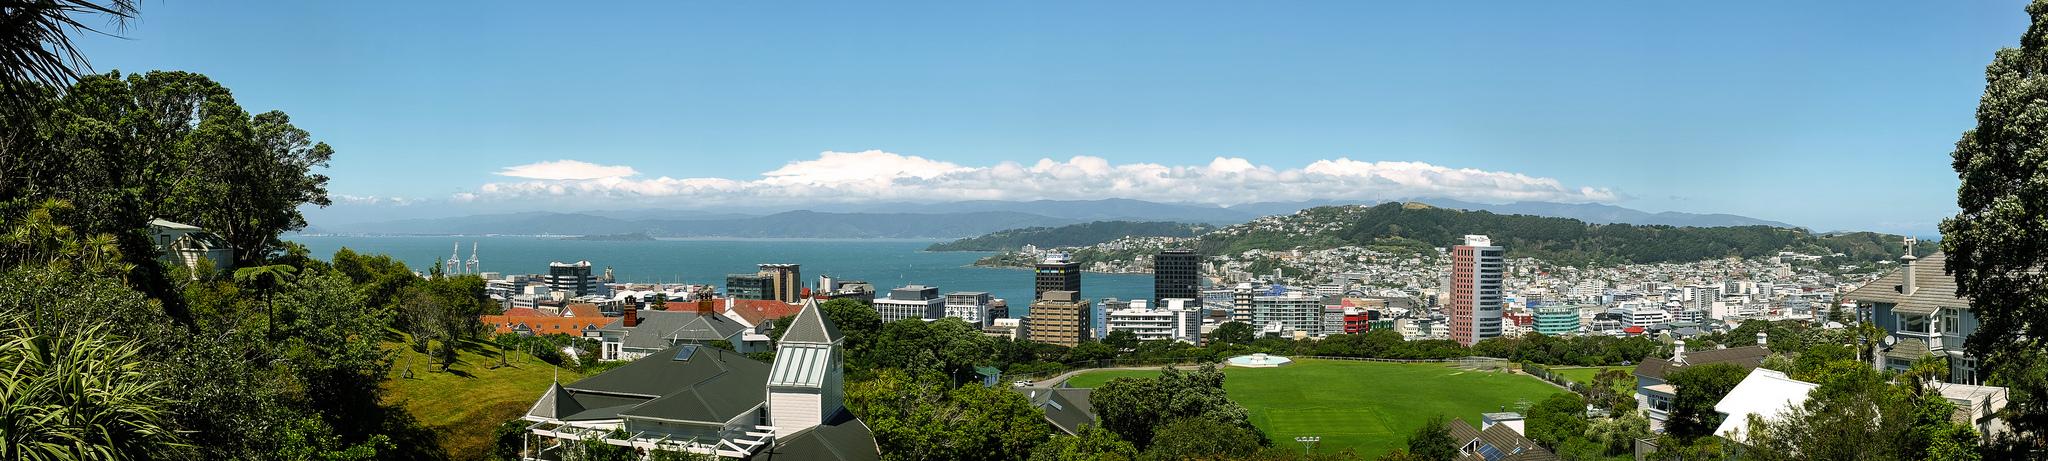 Wellingtonpano_MichaelYuen.jpg